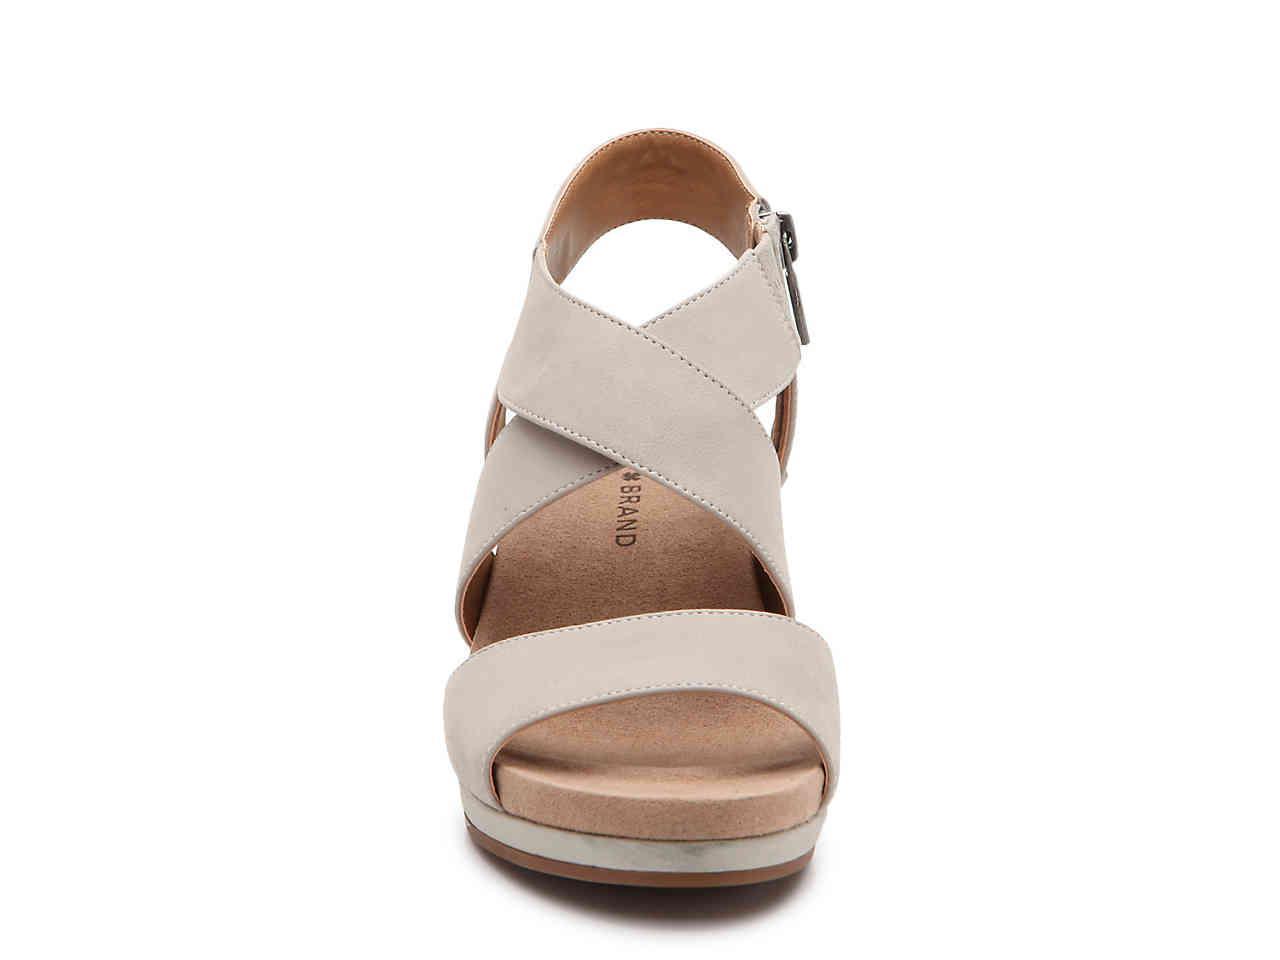 81ad5ccfb0 Lucky Brand Kakina Wedge Sandal in Gray - Lyst